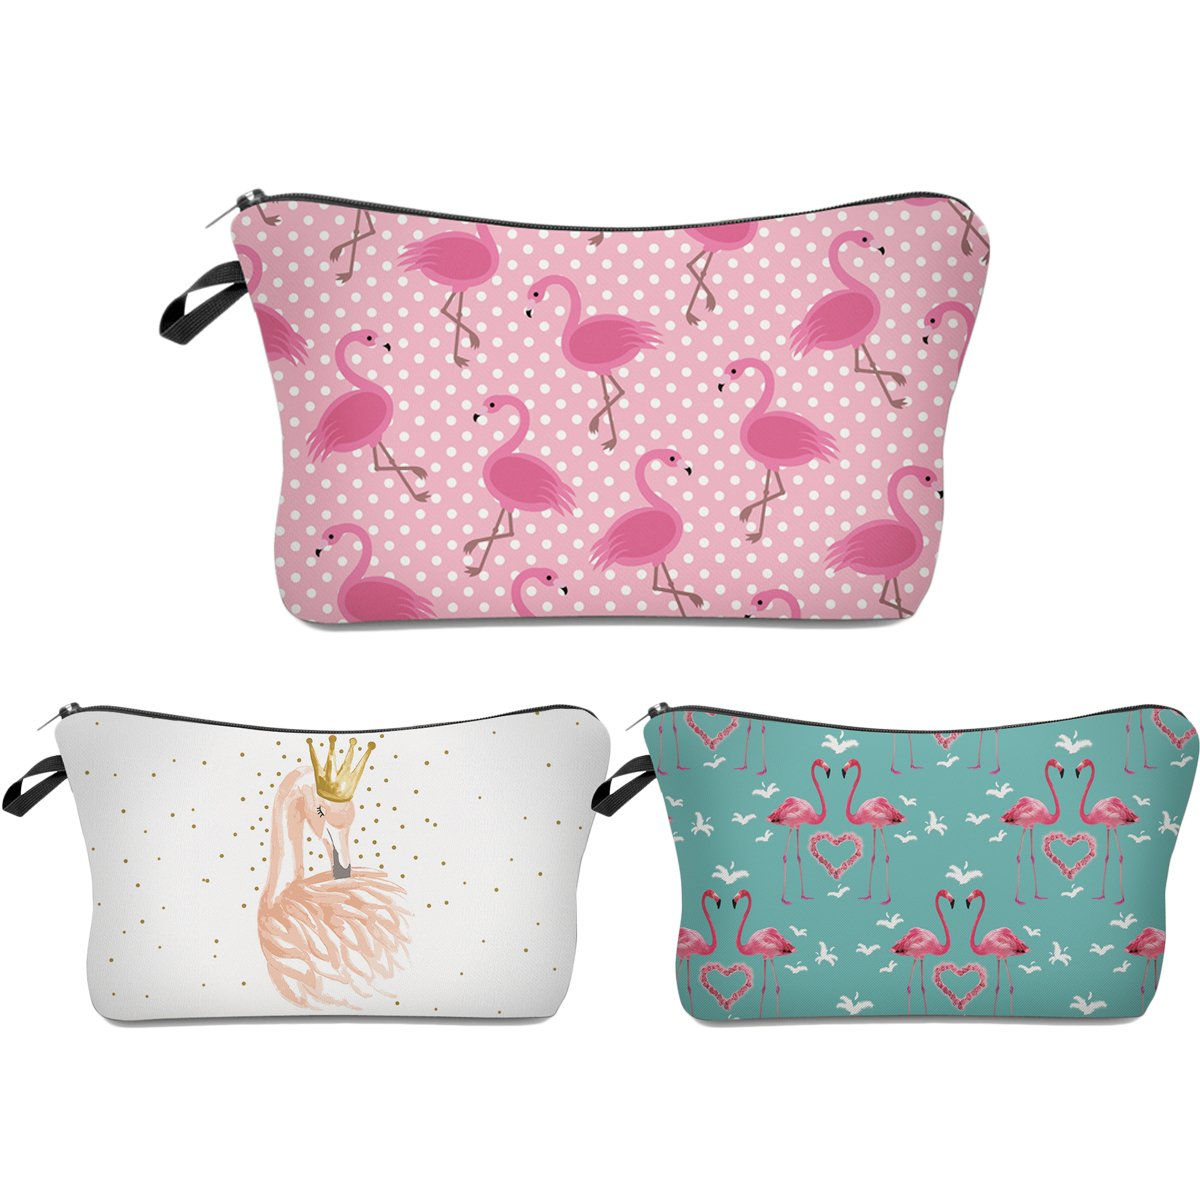 Deanfun 3pcs/set Super Funny 3D Printing women cosmetic bag Multifuncition Pencil Holder (unicorn) (Flamingos) 665107150067